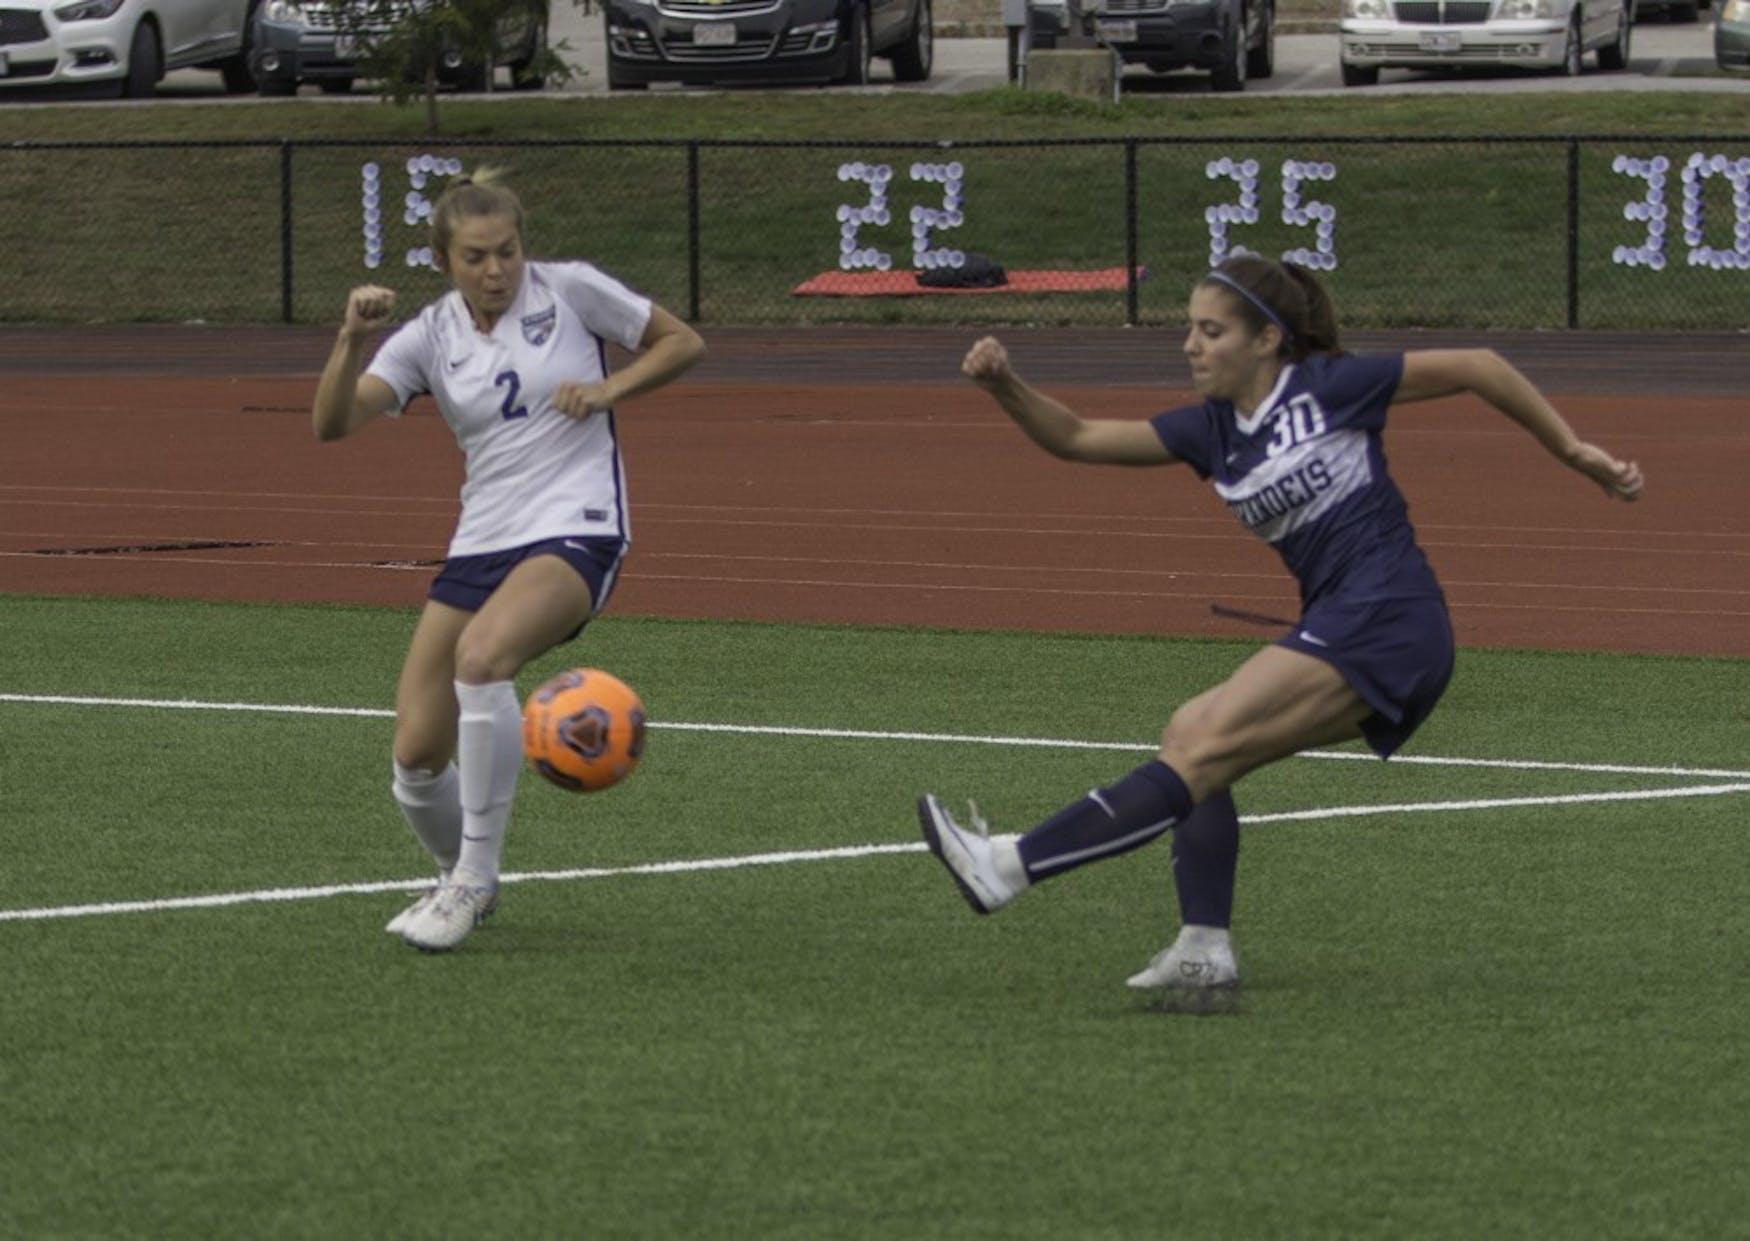 soccer-w-vs-emory-10-14-18-cc-0095